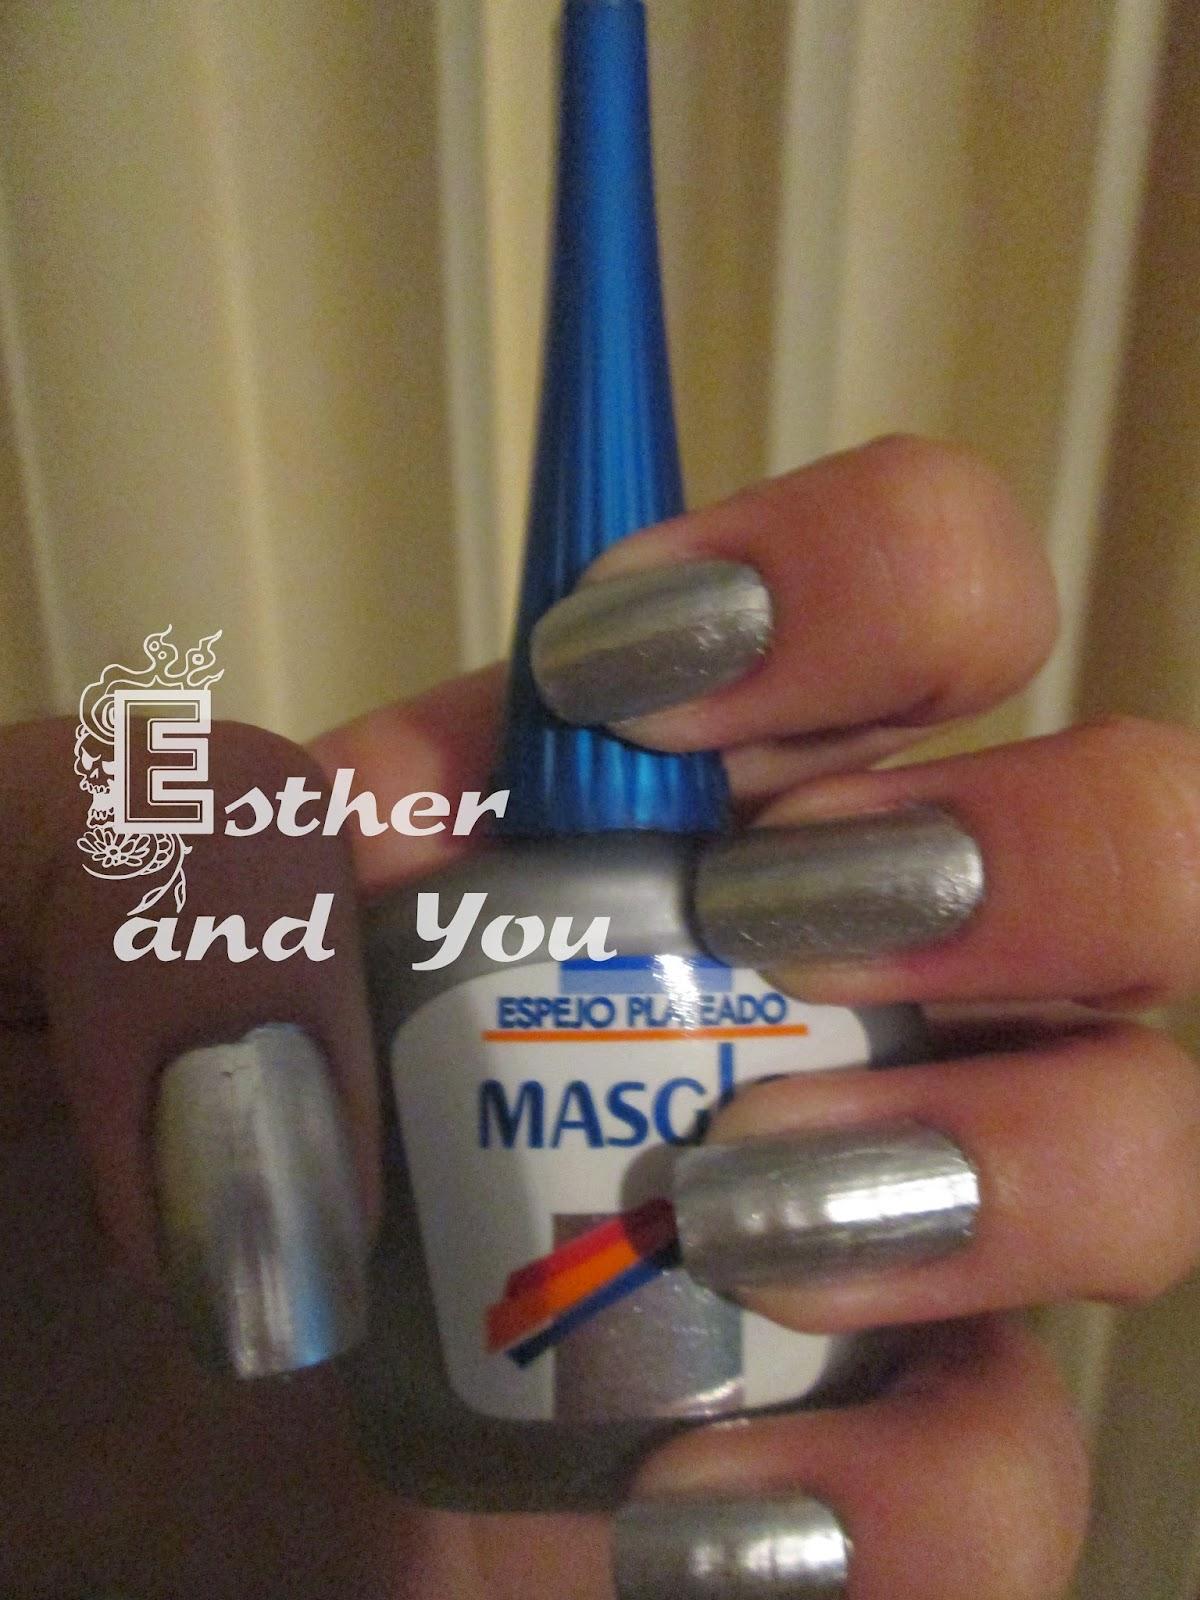 EstheR and U: Manicura Espejo